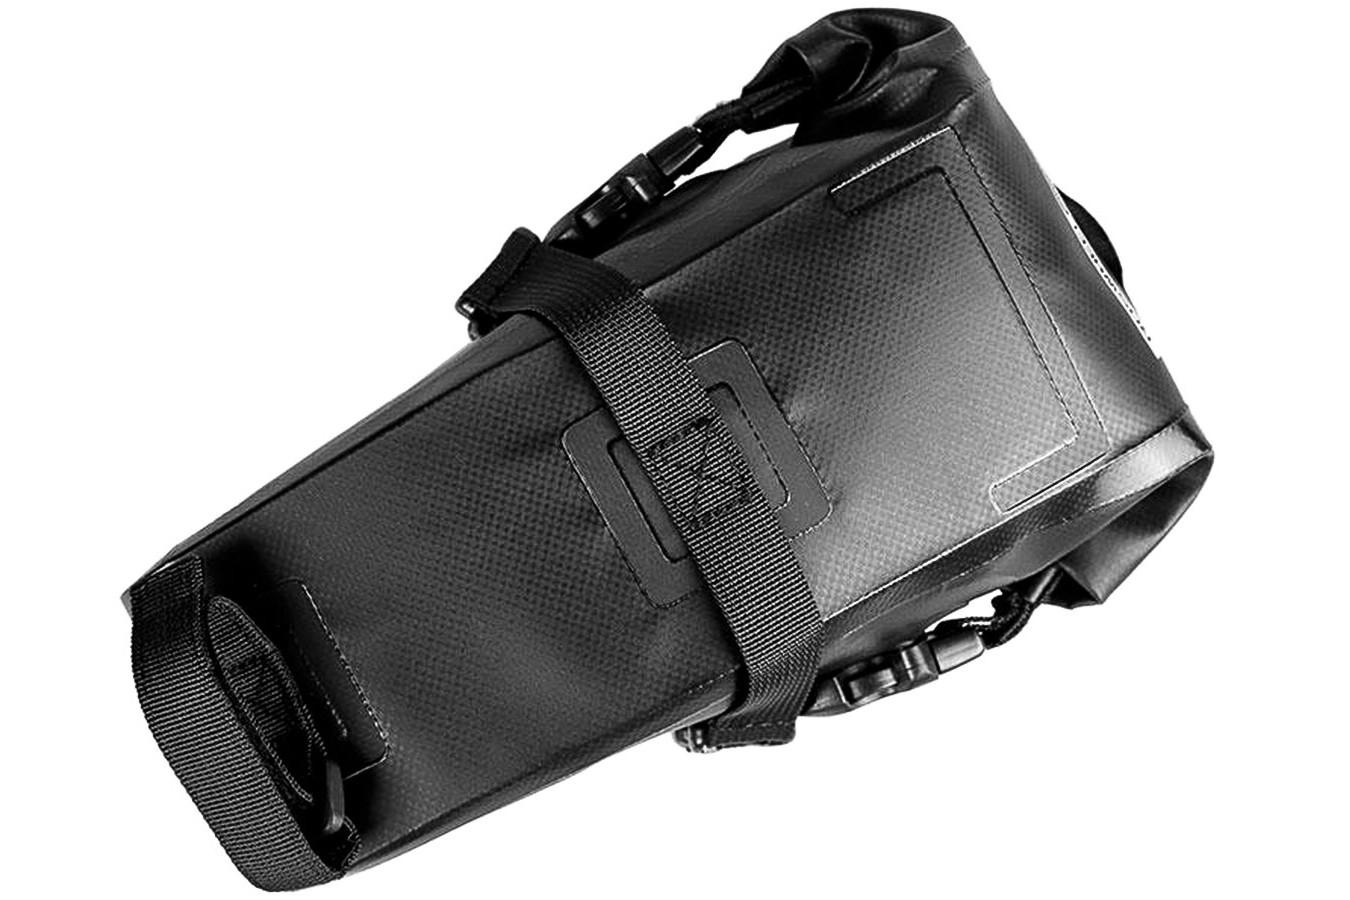 Bolsa para Selim Ajustável 1-1,5 litro impermeável PVC Roswheel